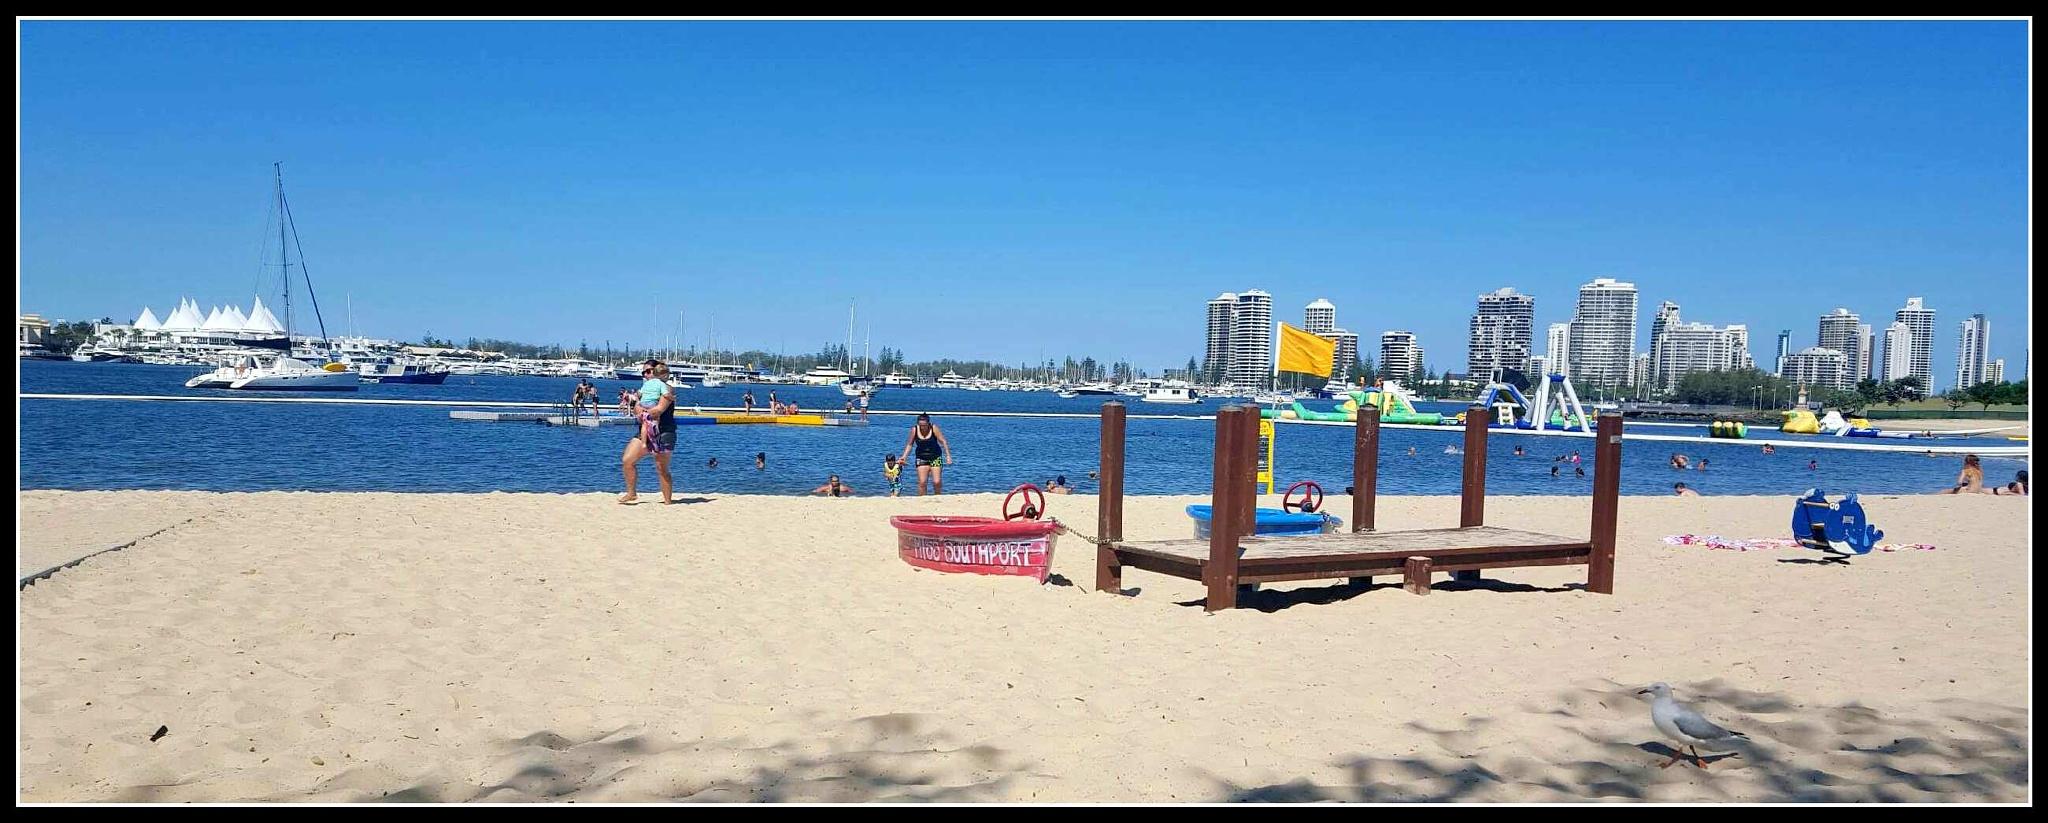 The Broadwater parklands ..Gold Coast Australia by Joanne Korner